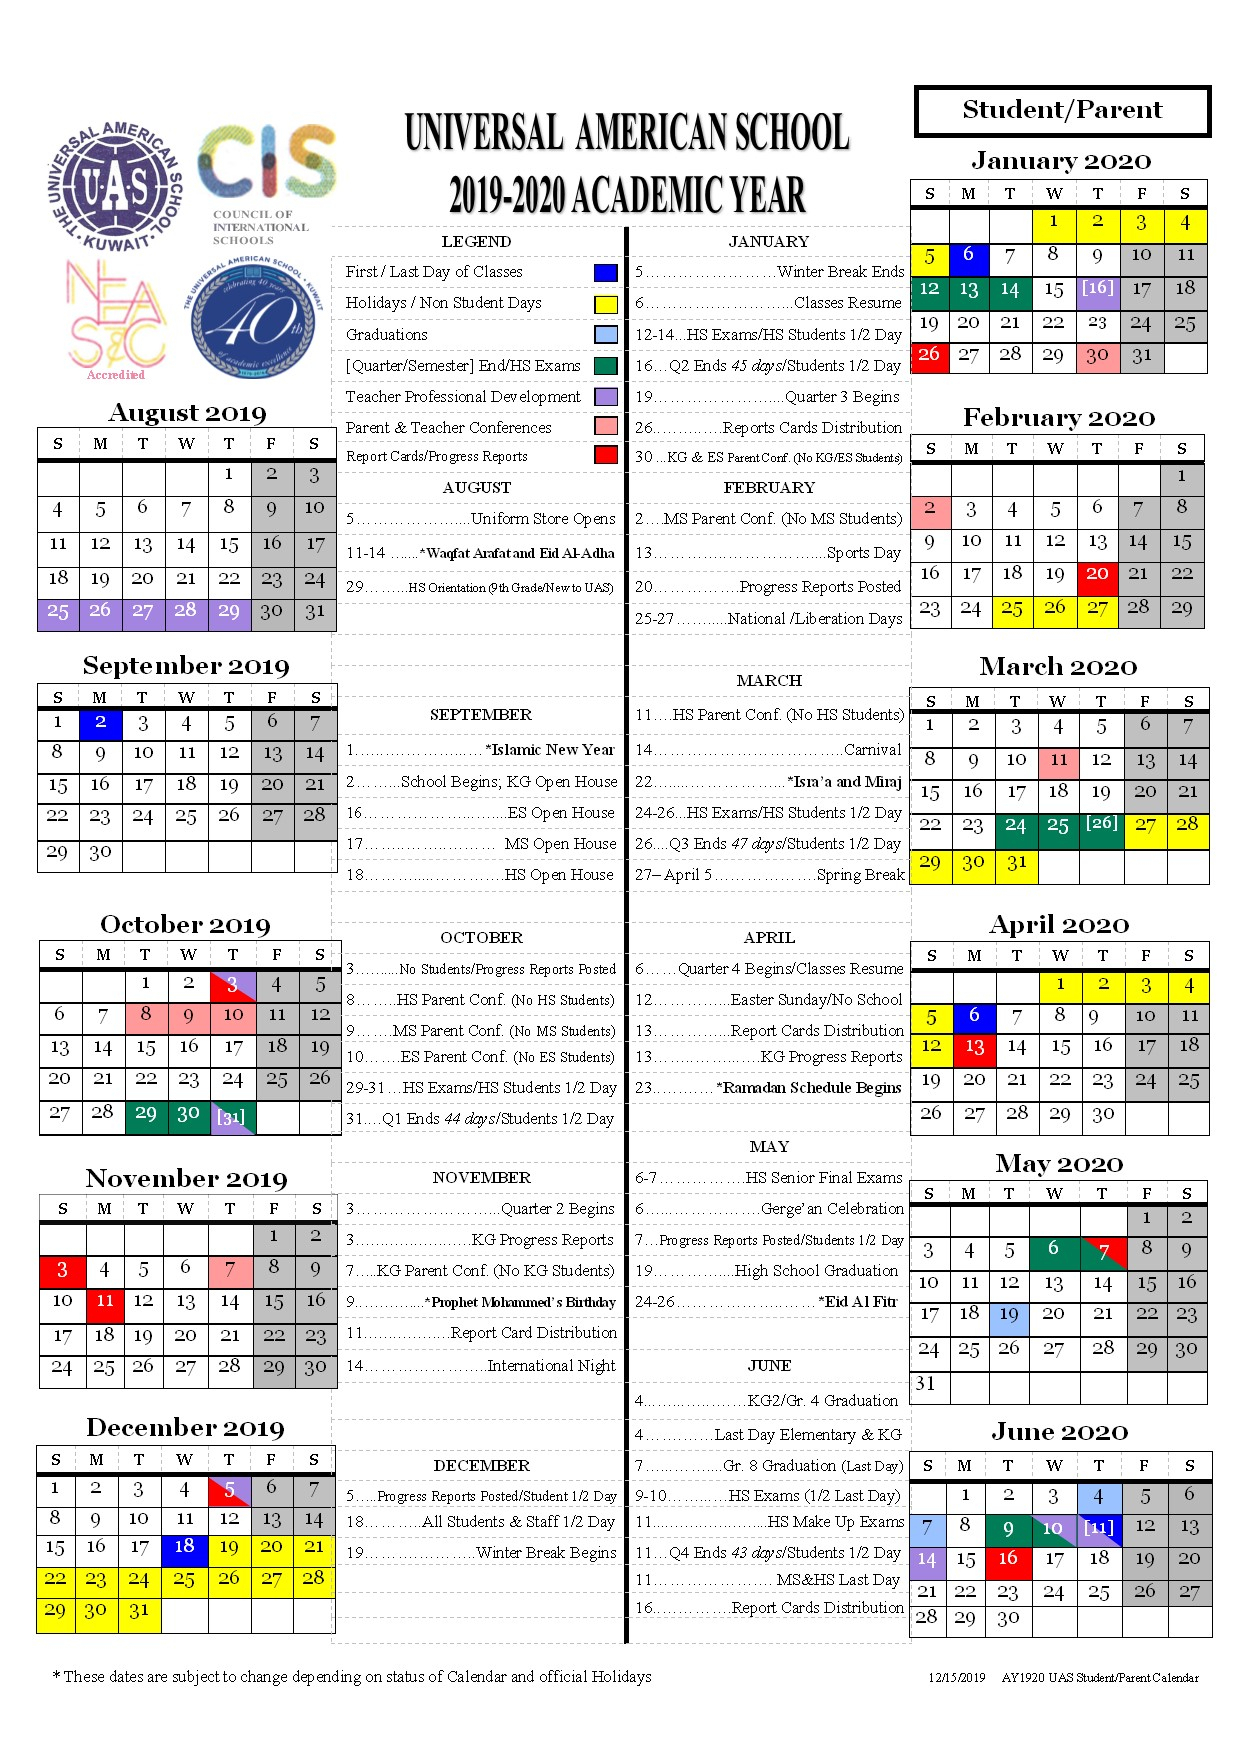 Students Calendar 2019-2020 - Universal American School